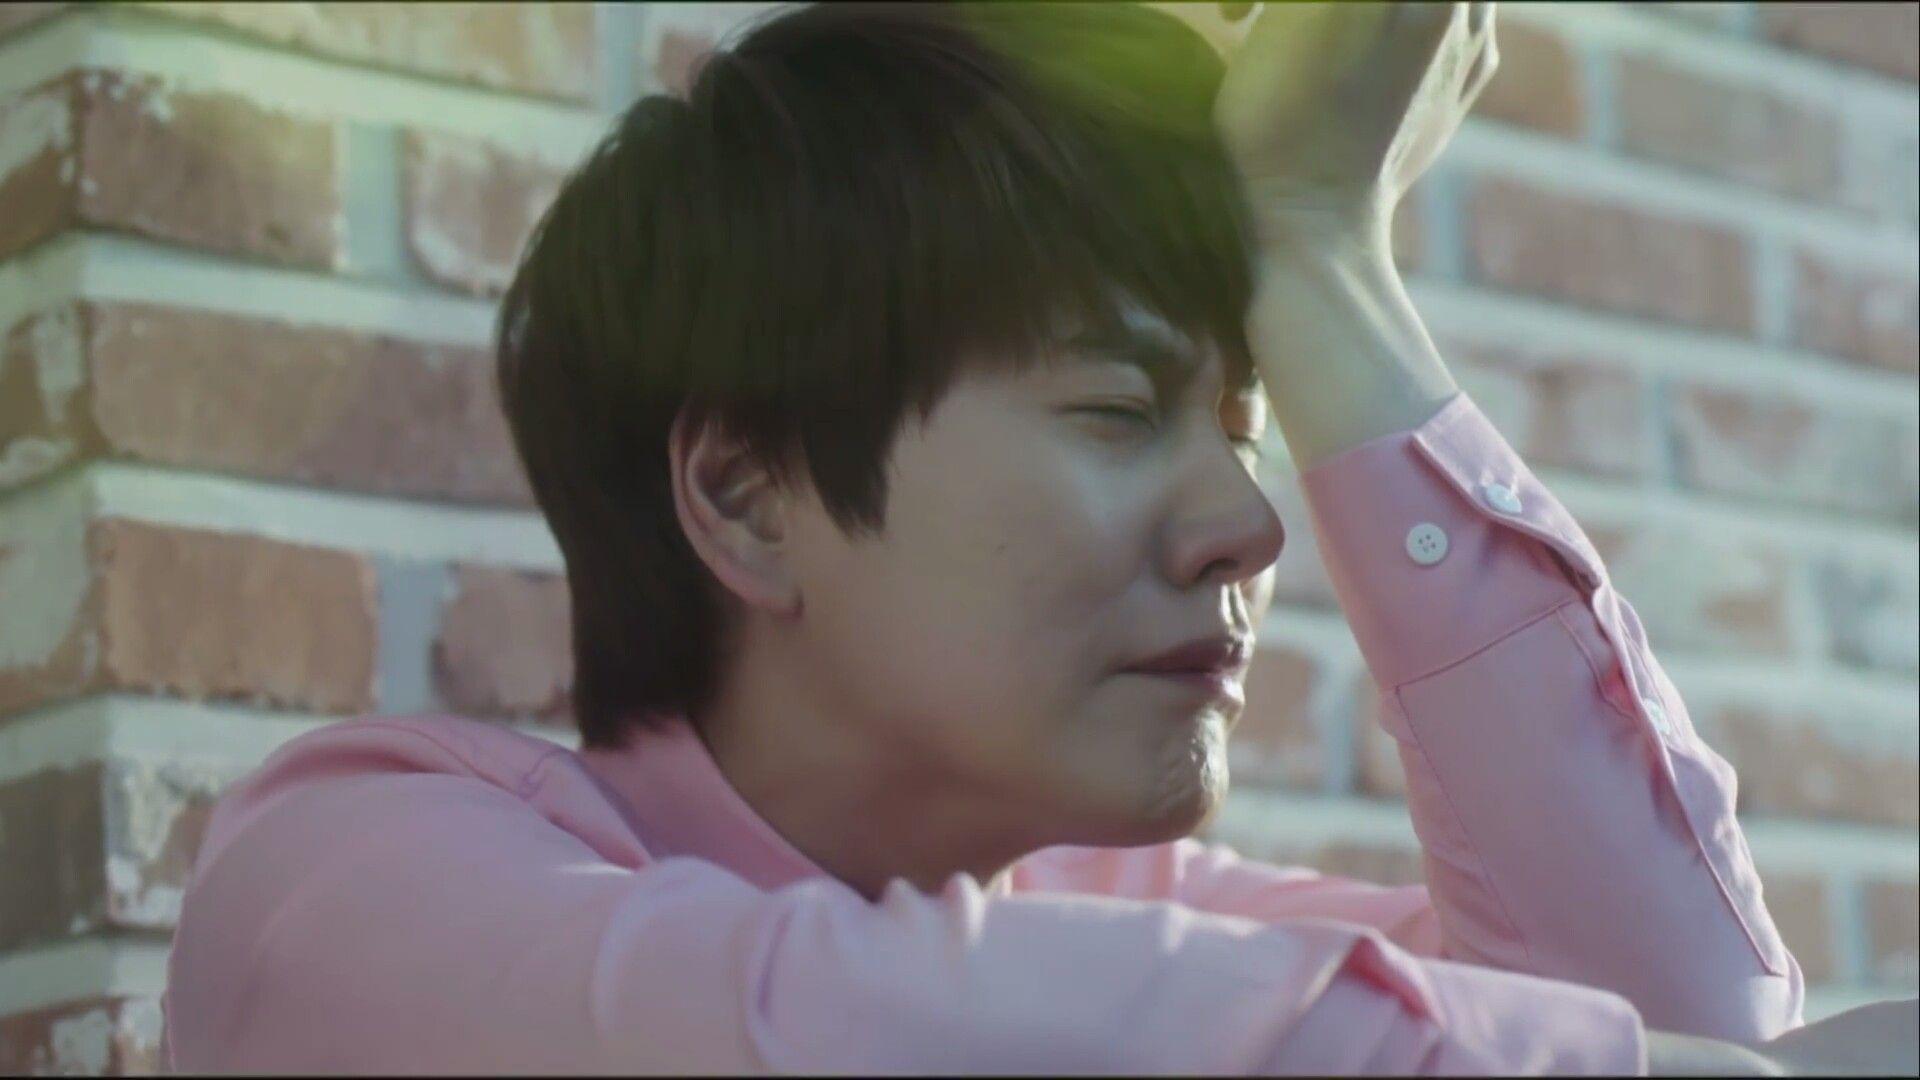 Poor Kyuhyun Let Me Give U A Hug